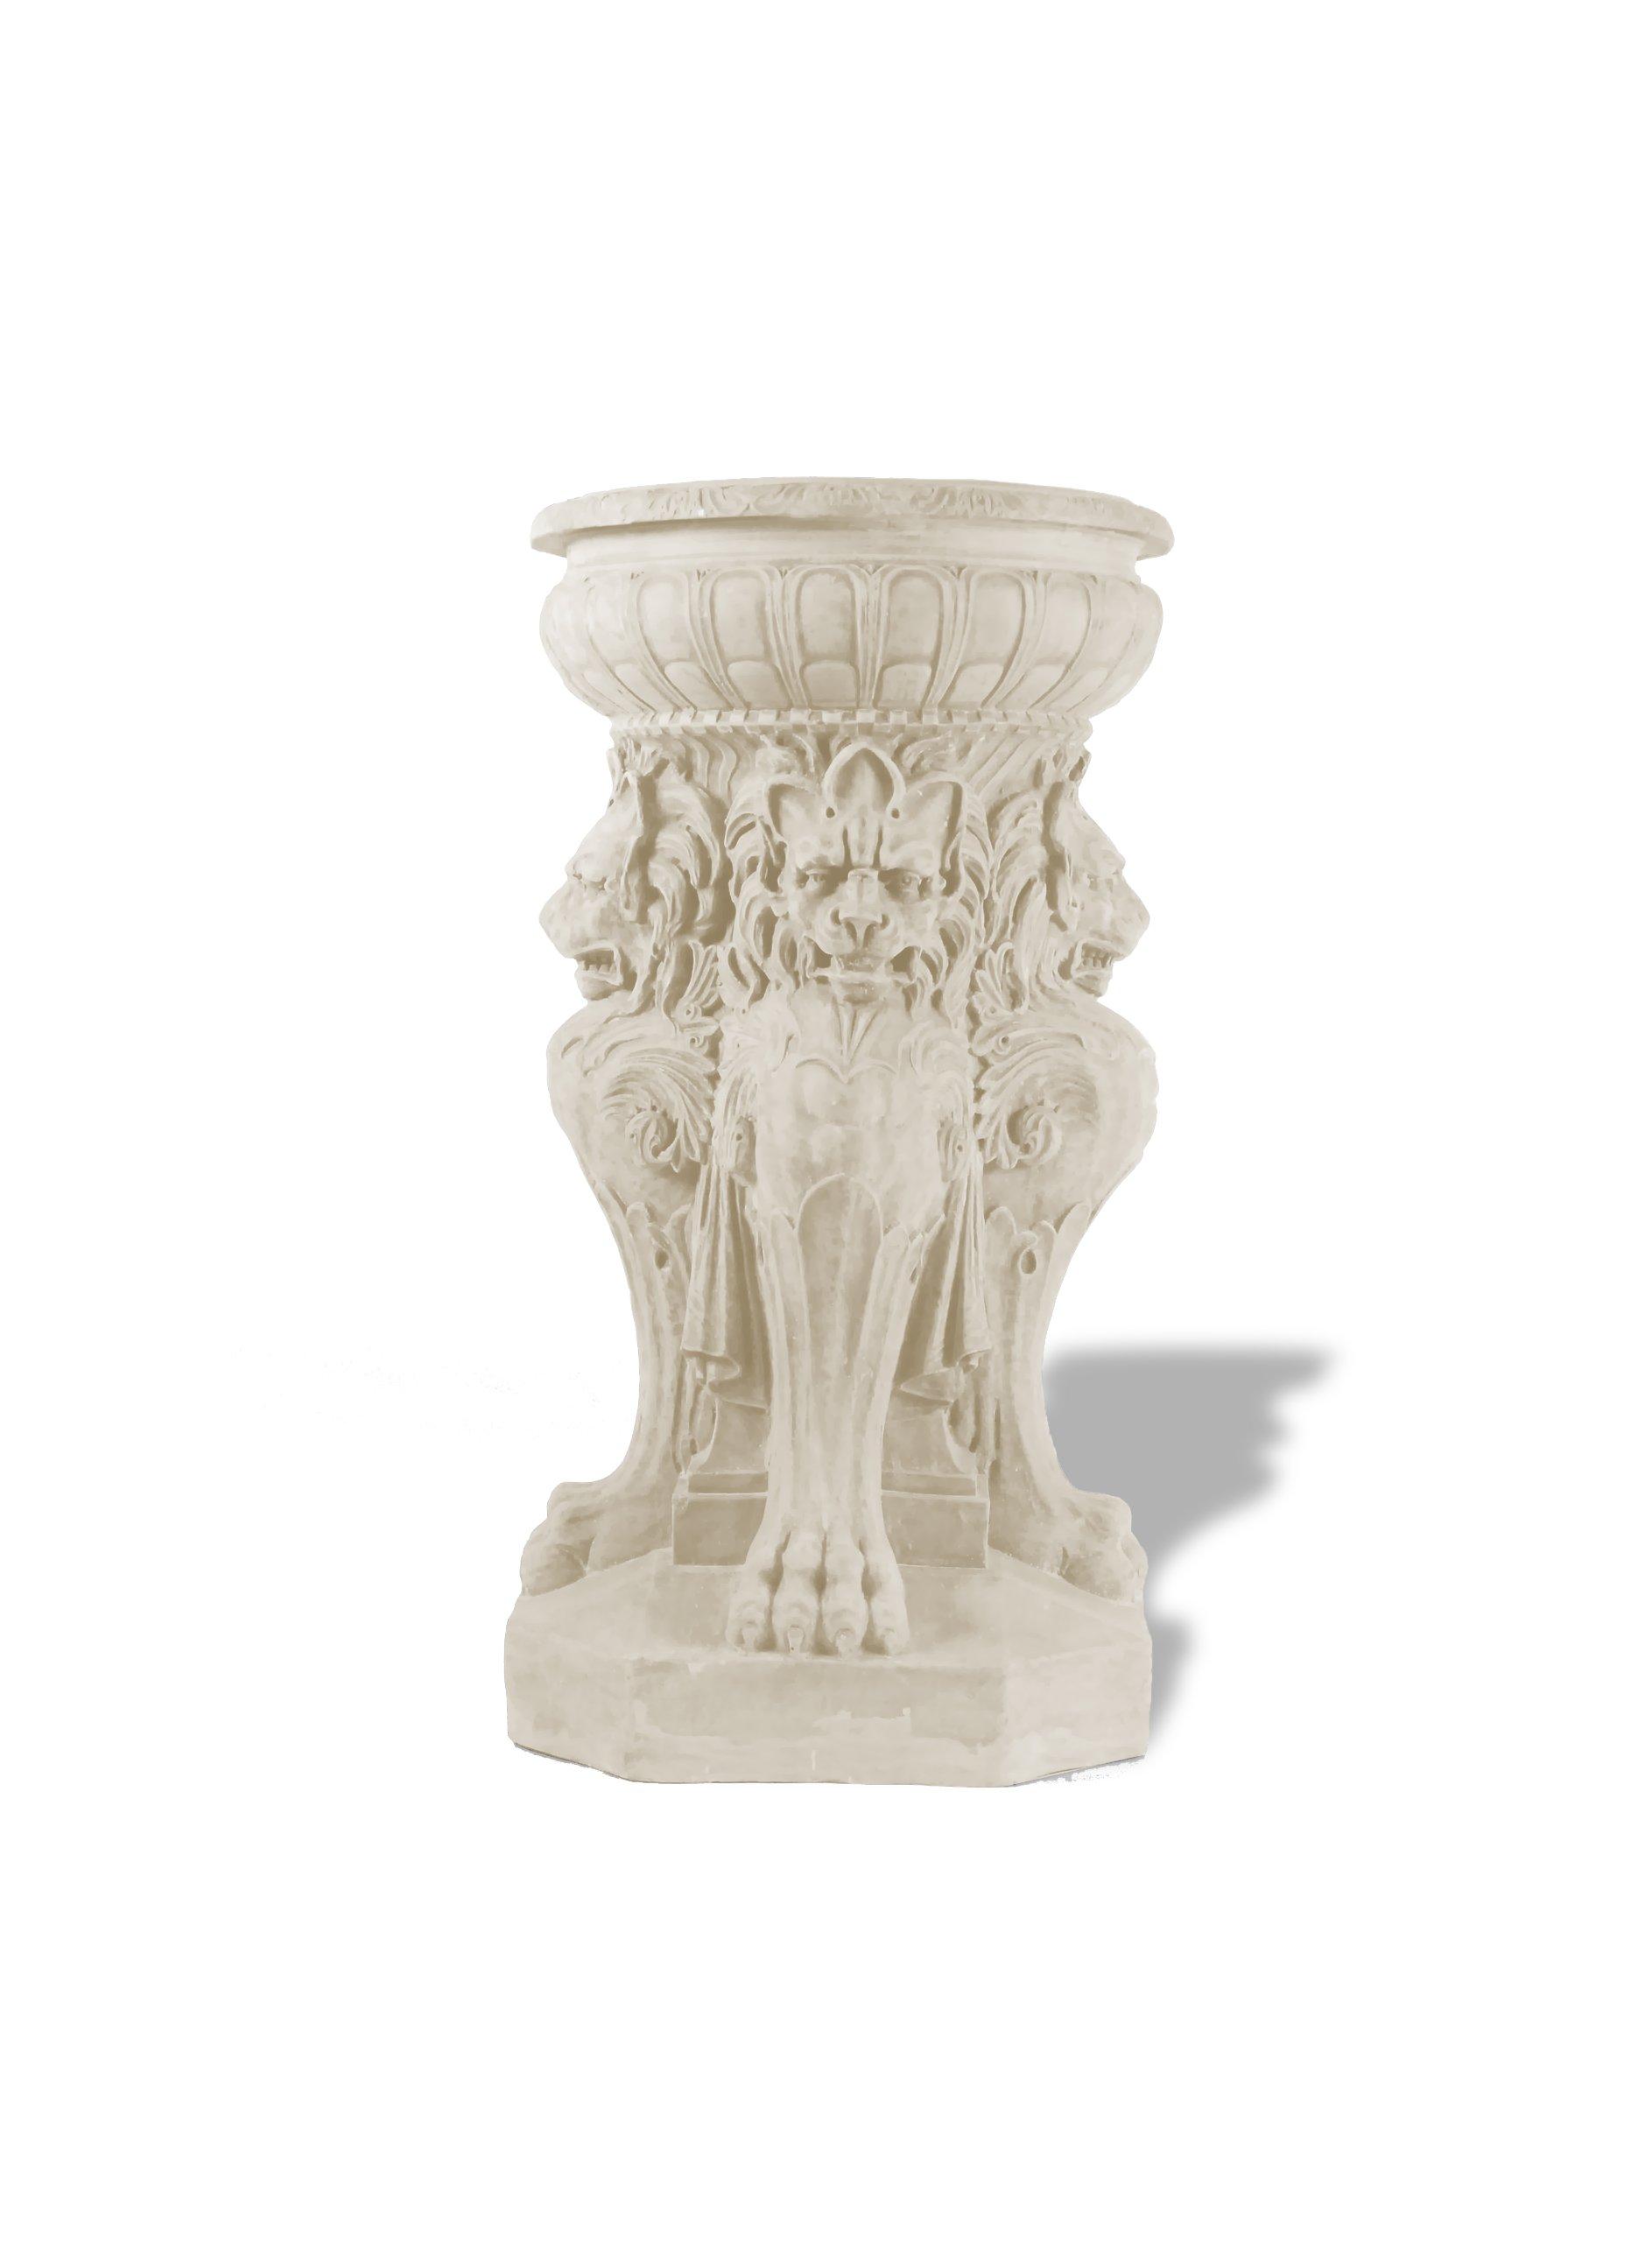 Amedeo Design ResinStone 1001-7L Victorian Lion Fountain / Urn, 18 by 18 by 36-Inch, Limestone